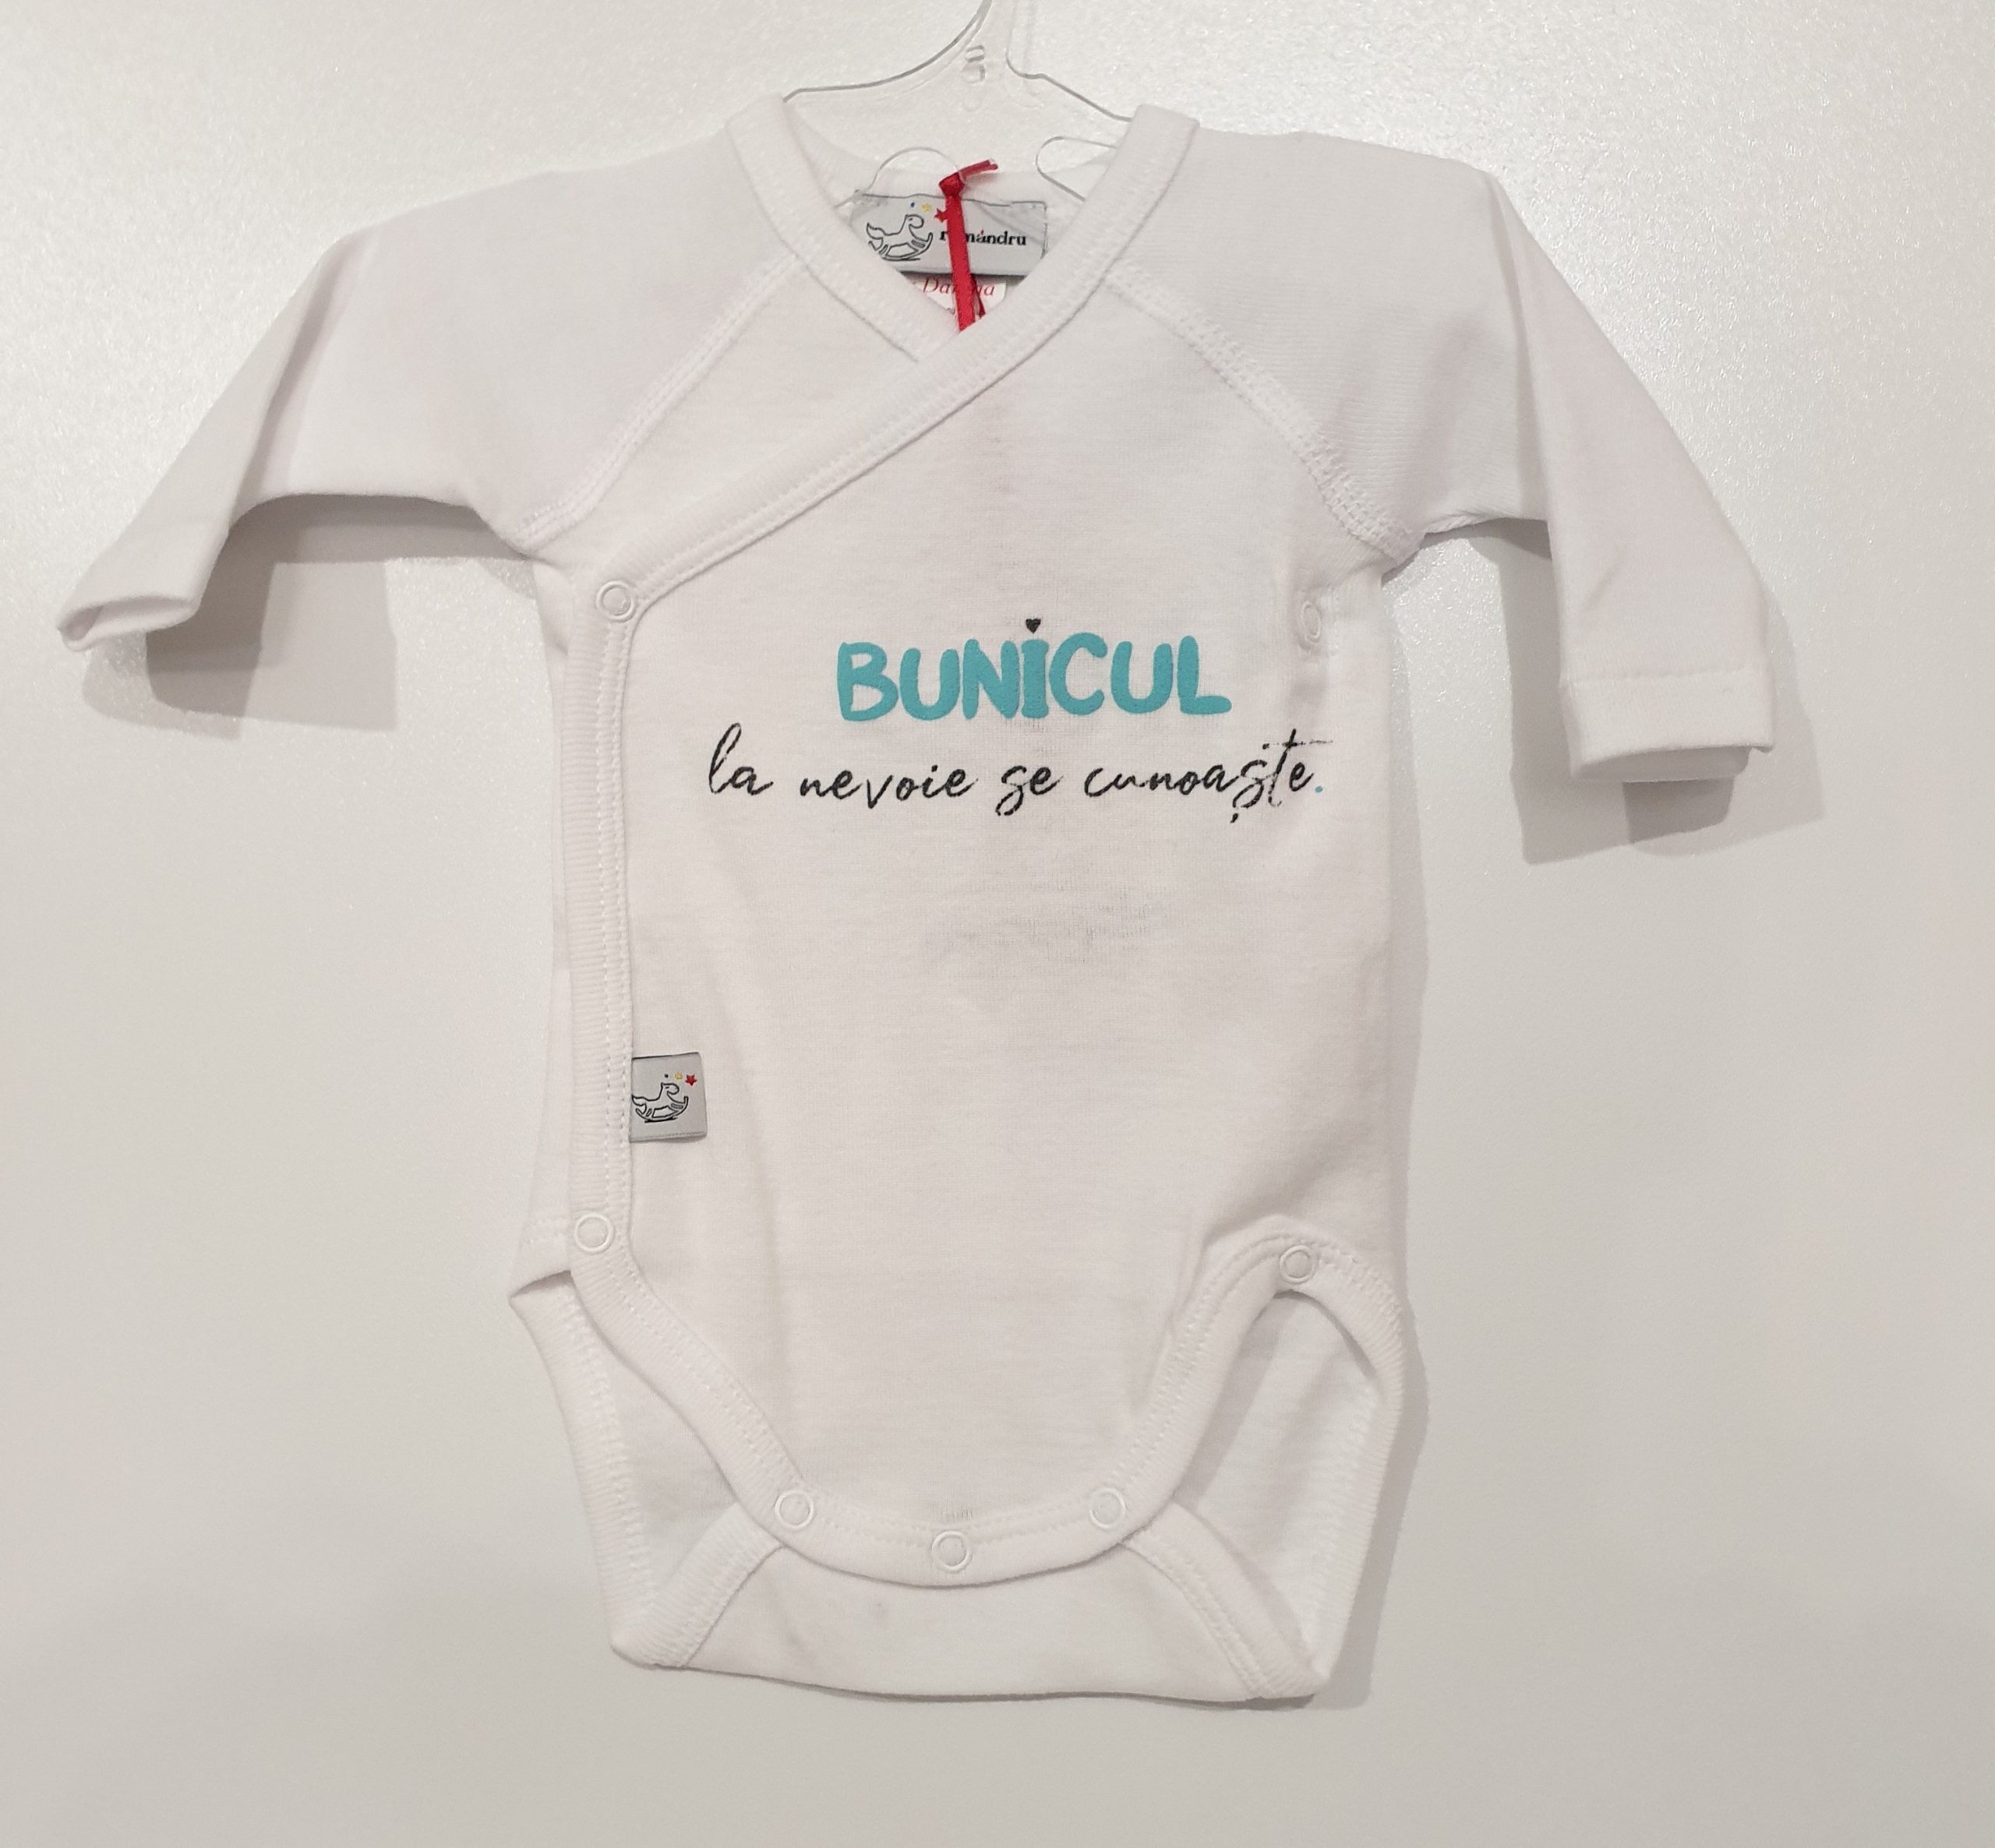 Body bebe Alb ML NN Bunicul la nevoie se cunoaste